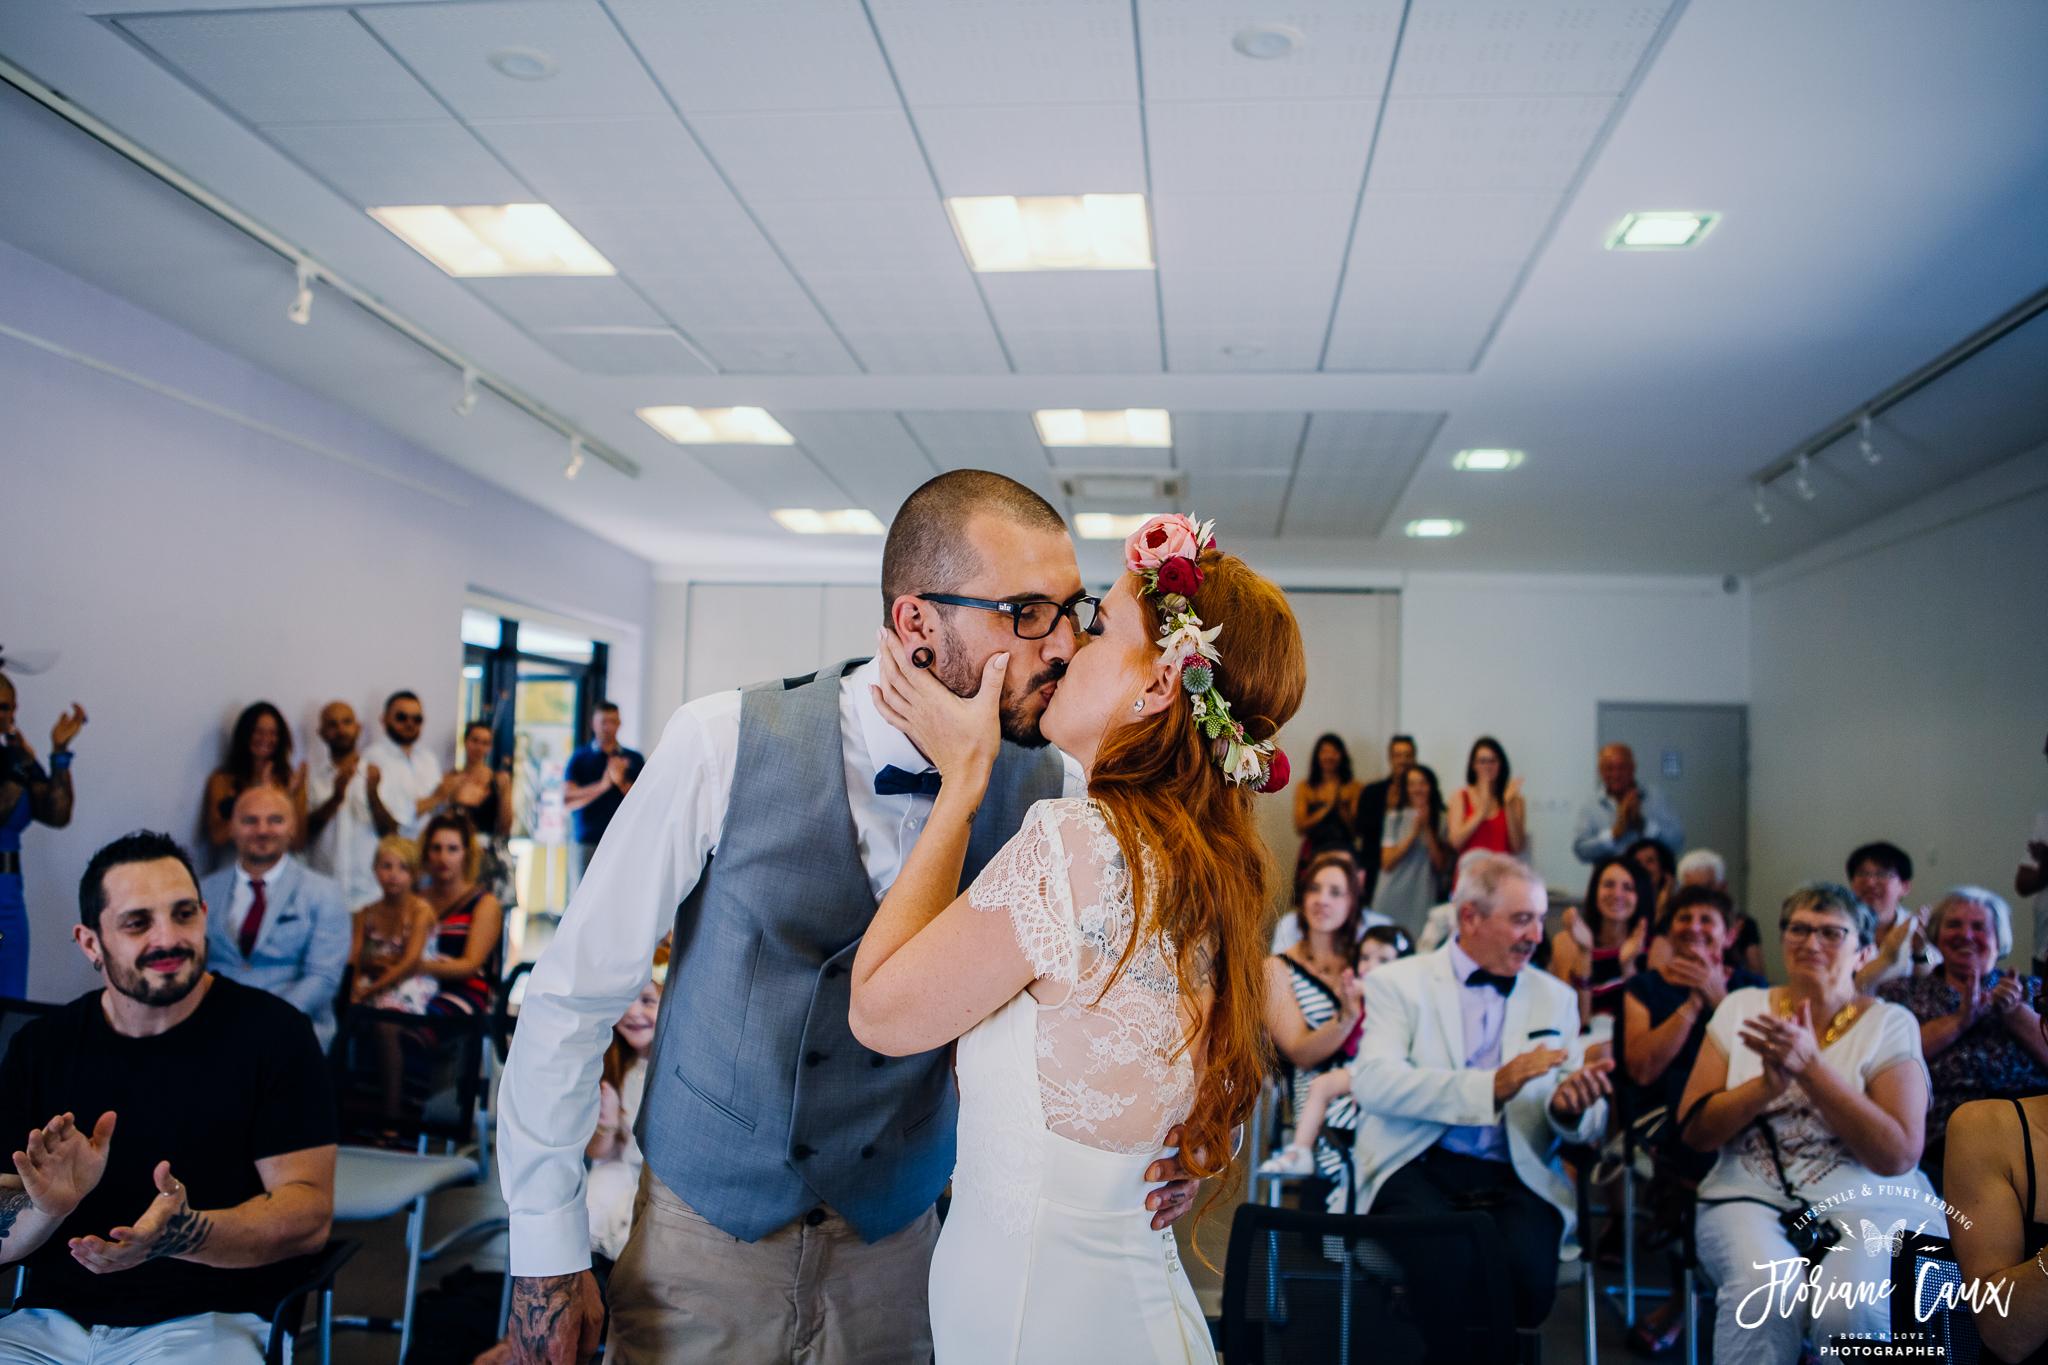 photographe-mariage-toulouse-rocknroll-maries-tatoues-floriane-caux-30